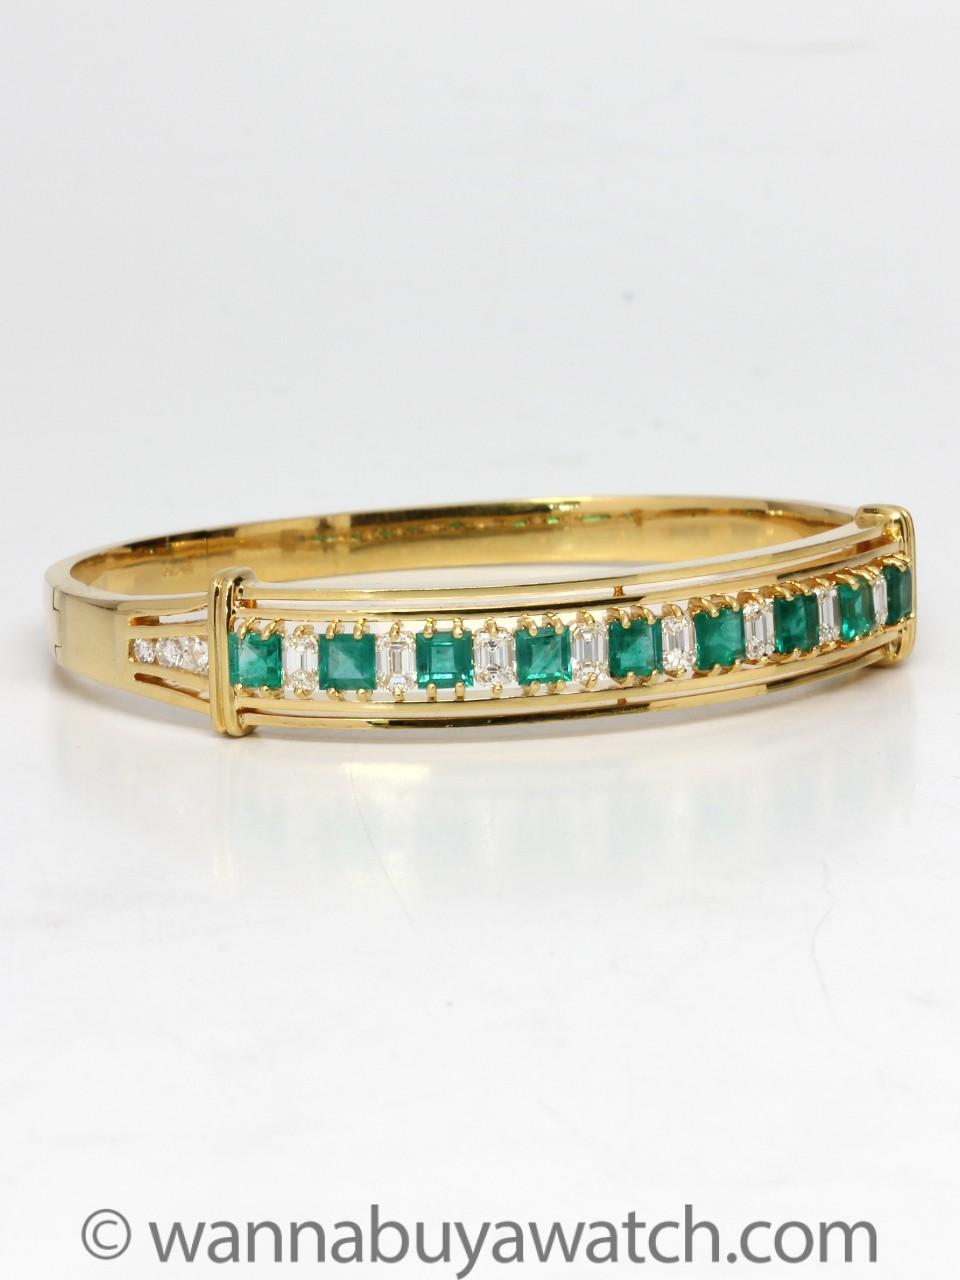 18K Yellow Gold with Emeralds & Diamonds